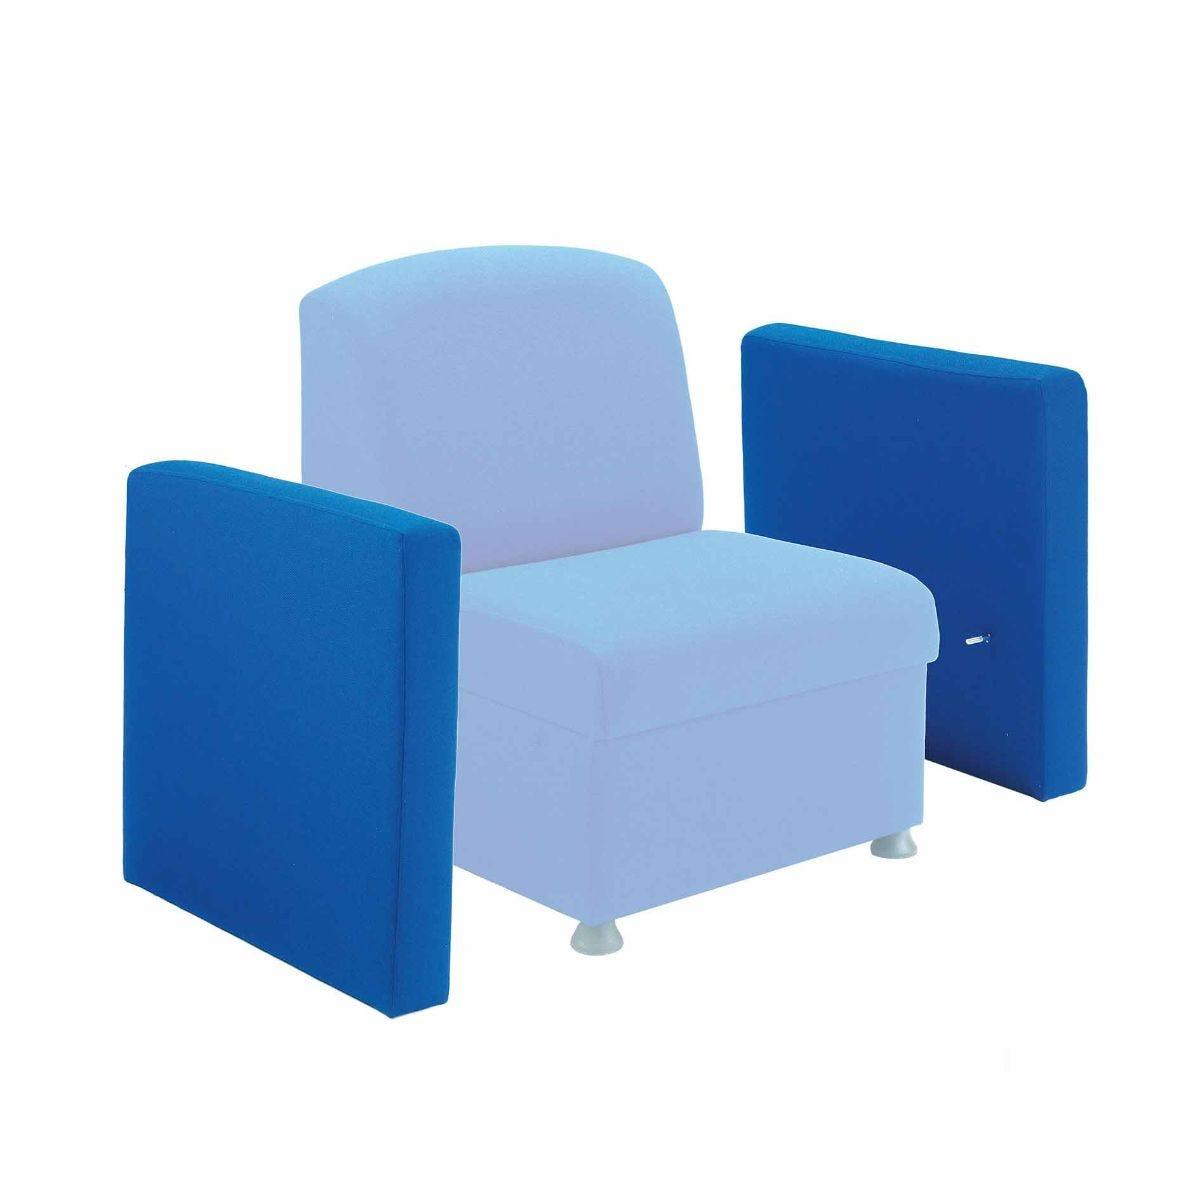 TC Office TC Office Single Glacier Arm for Modular Reception Chair, Royal Blue | Desks > Modular Office Furniture > Modular Office Furniture